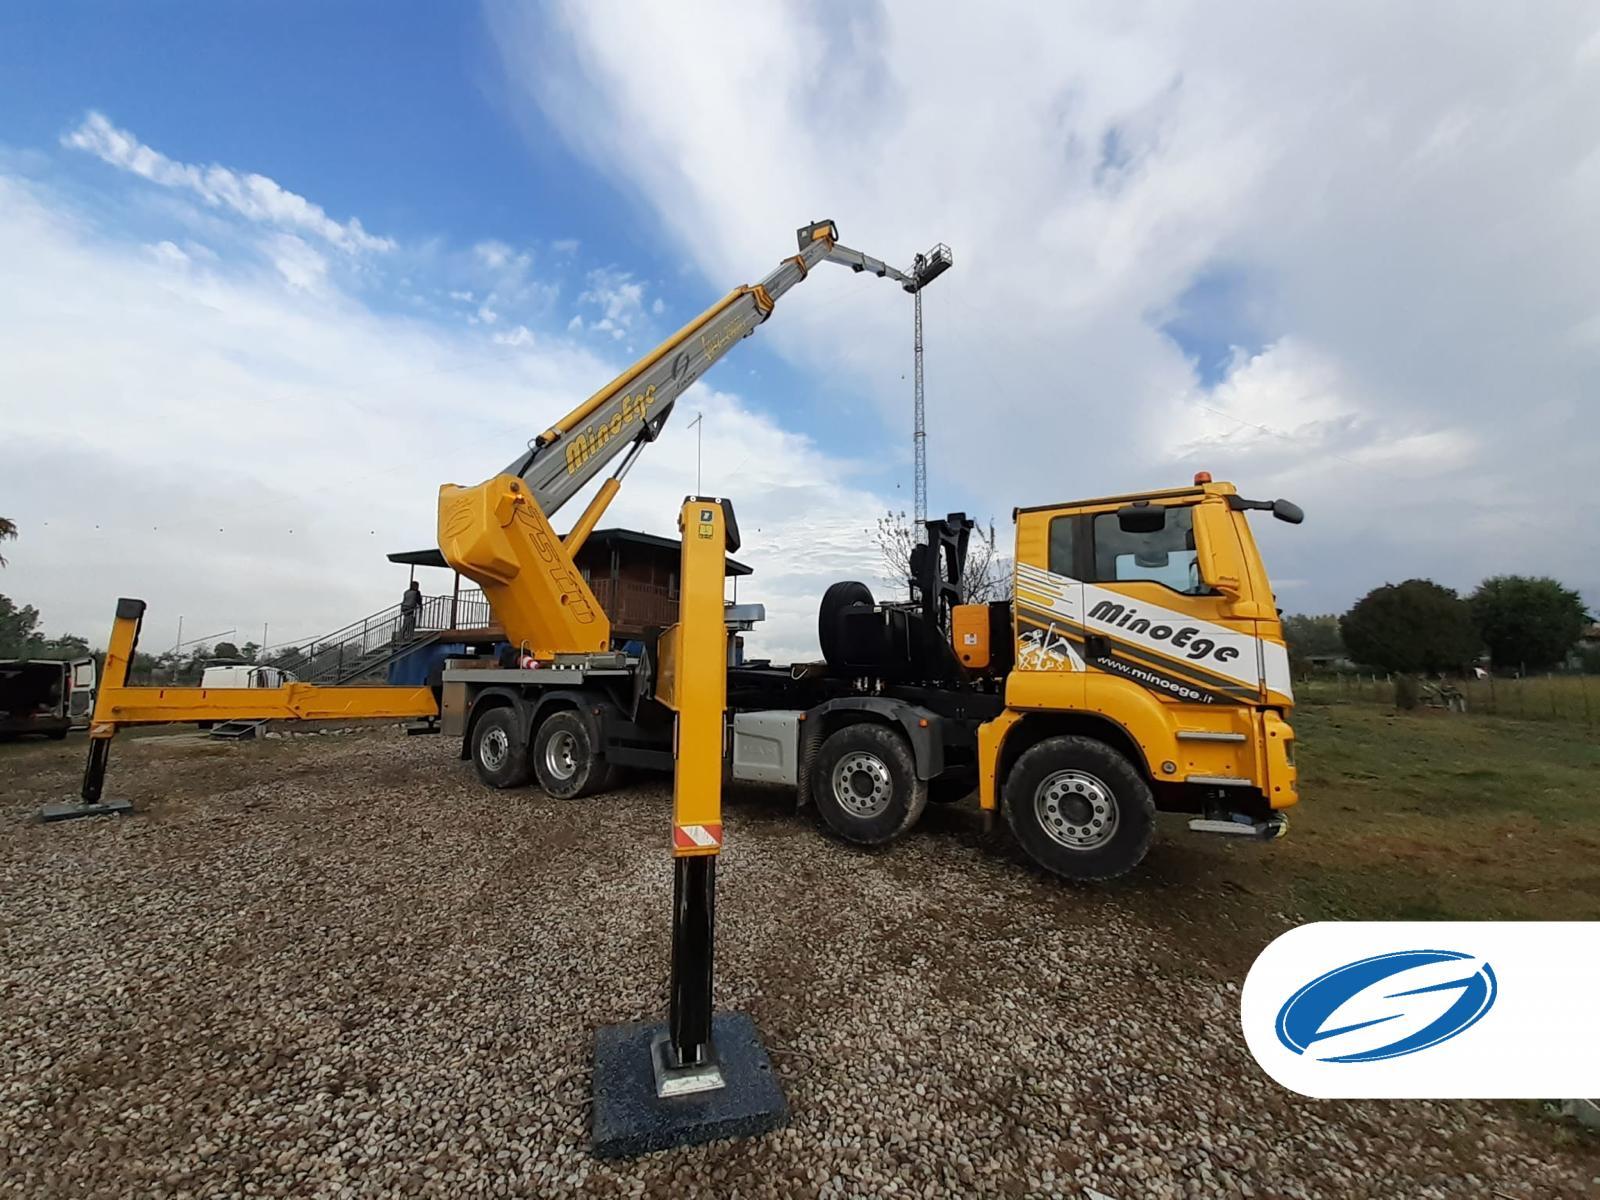 Aerial work platform 75TJ